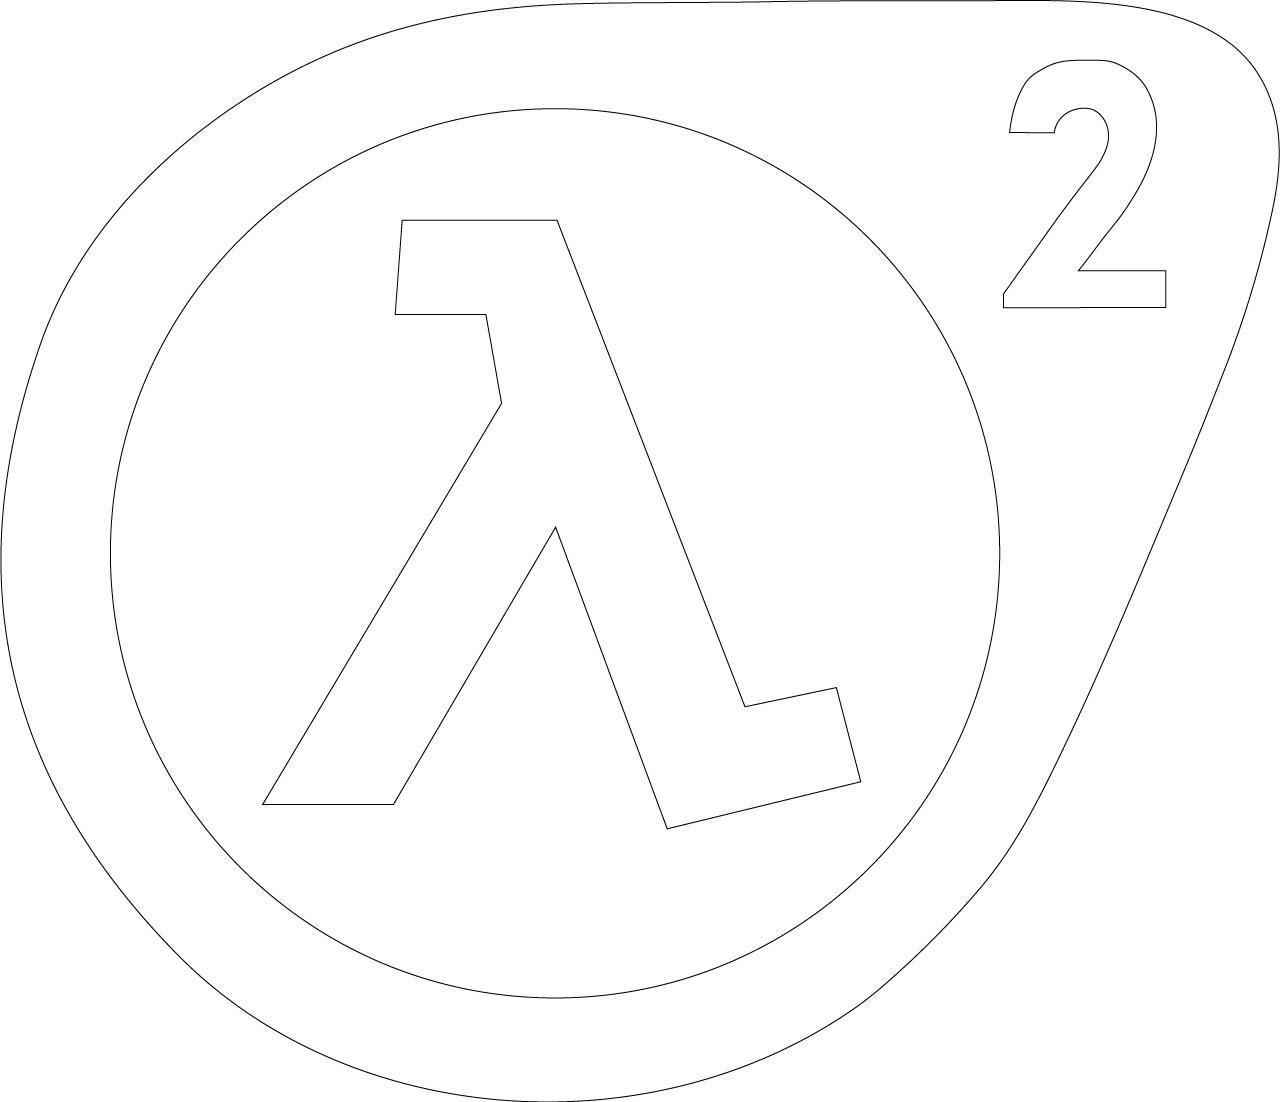 билайн лого вектор: